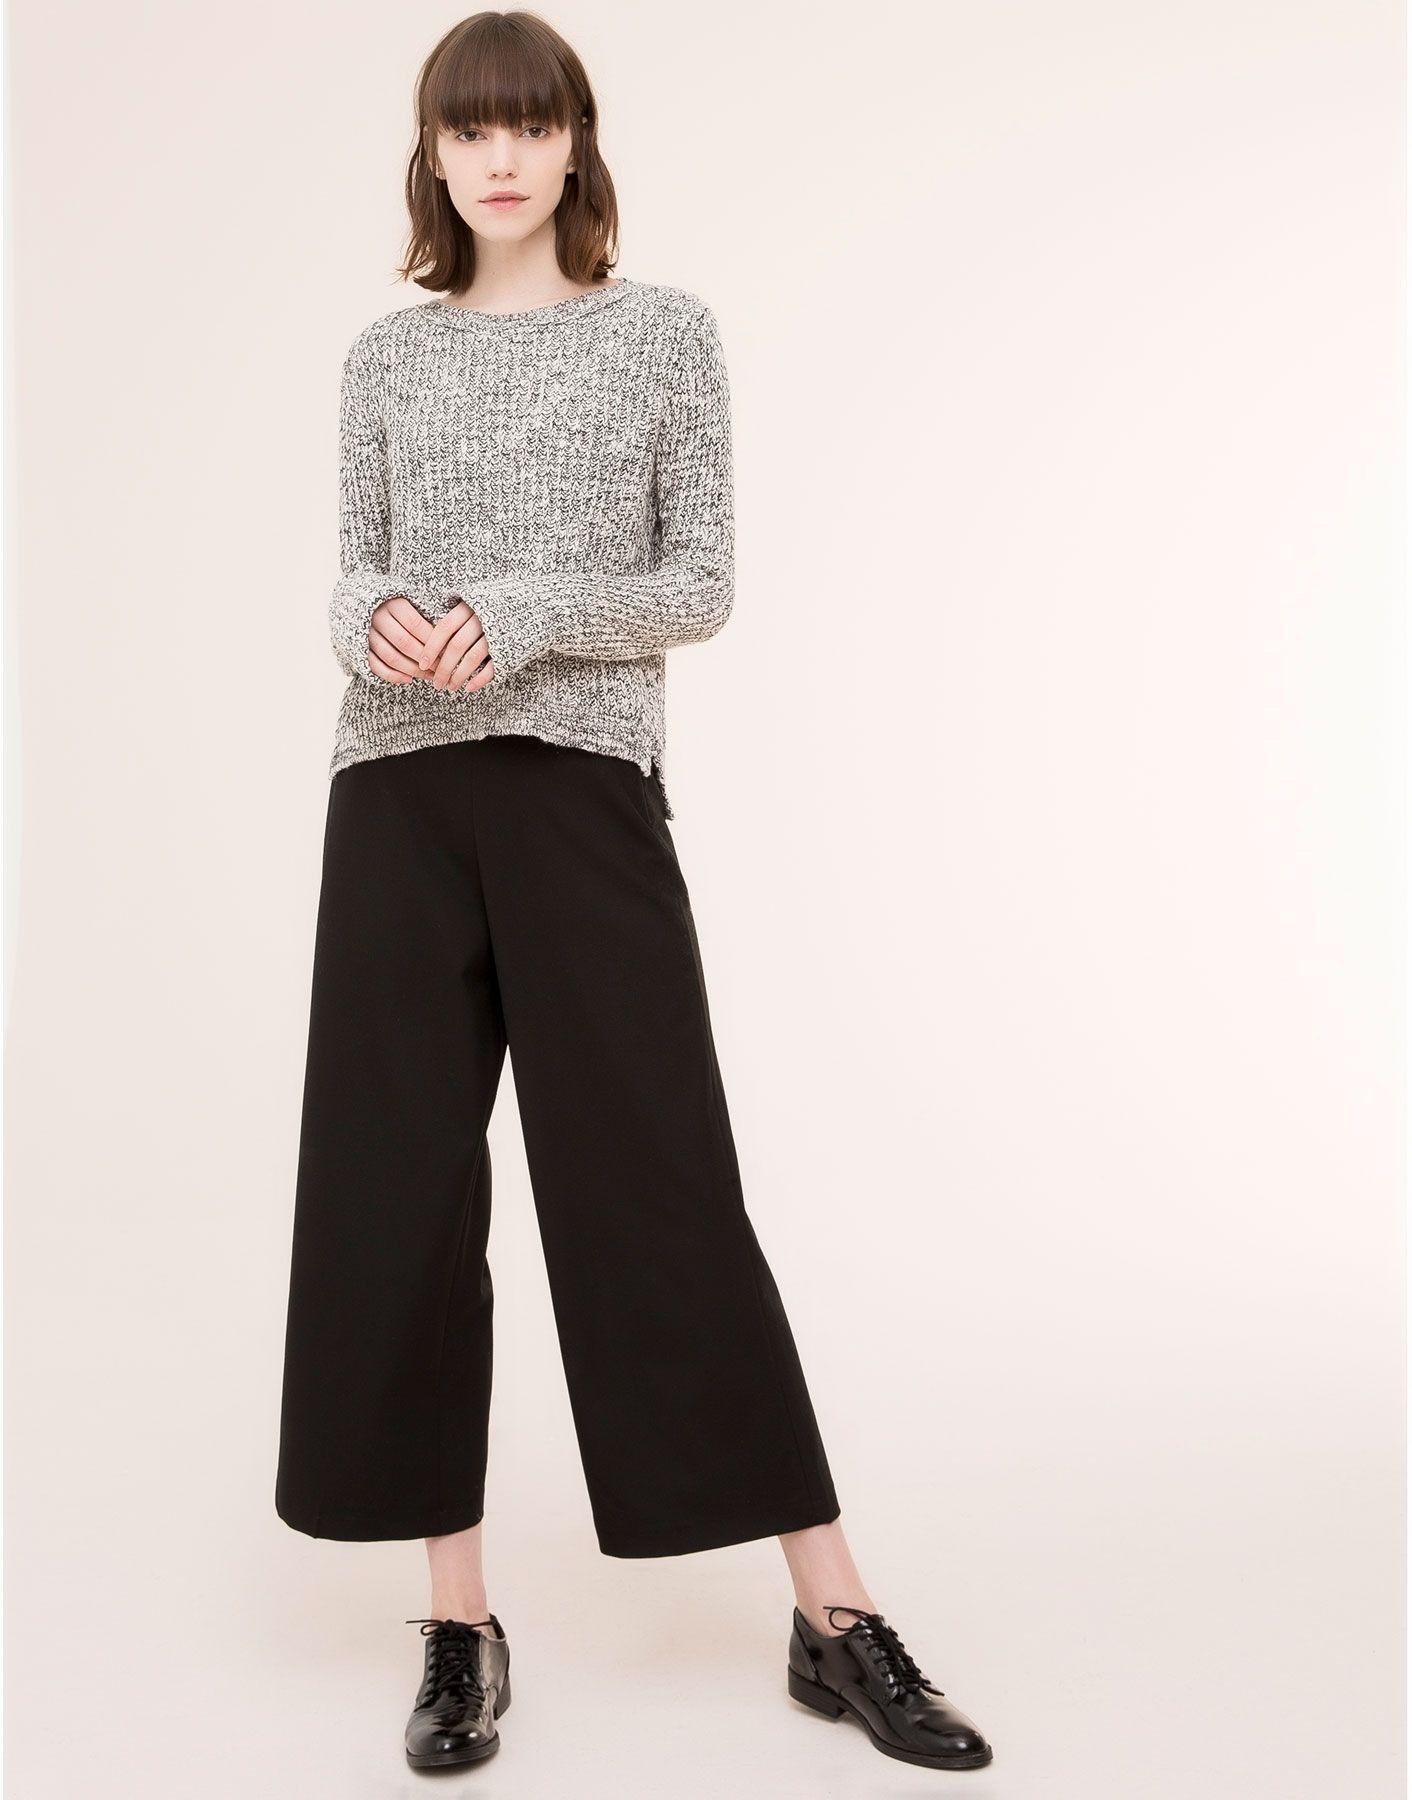 Scarpe per pantaloni larghi e corti: 5 idee | PG Magazine